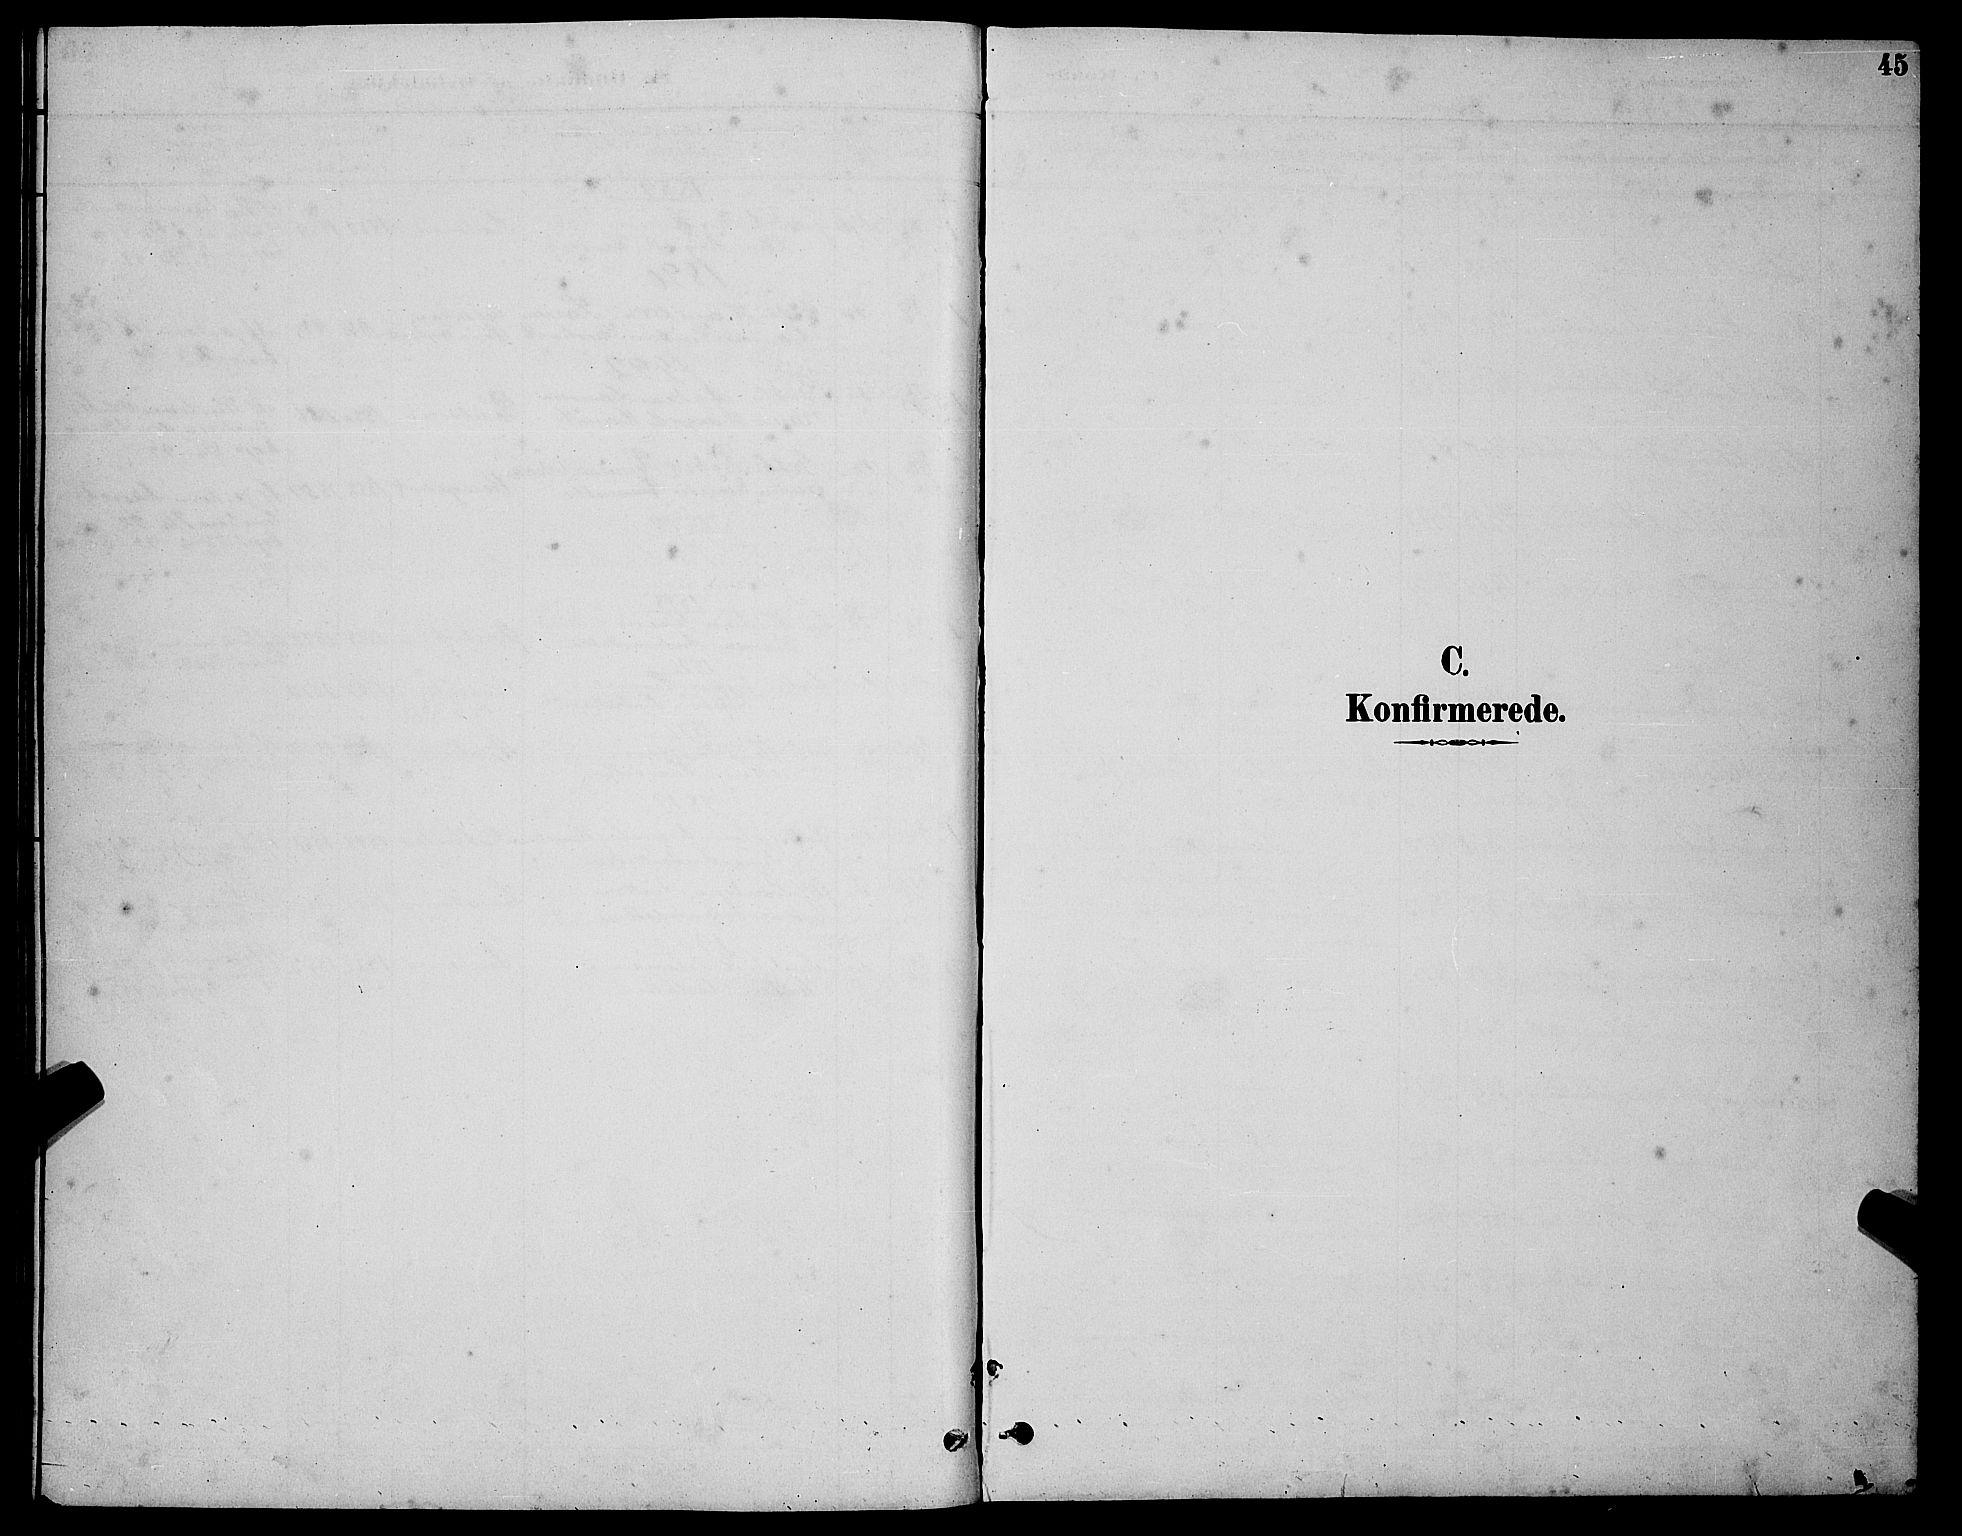 SATØ, Tranøy sokneprestkontor, I/Ia/Iab/L0004klokker: Klokkerbok nr. 4, 1888-1901, s. 45